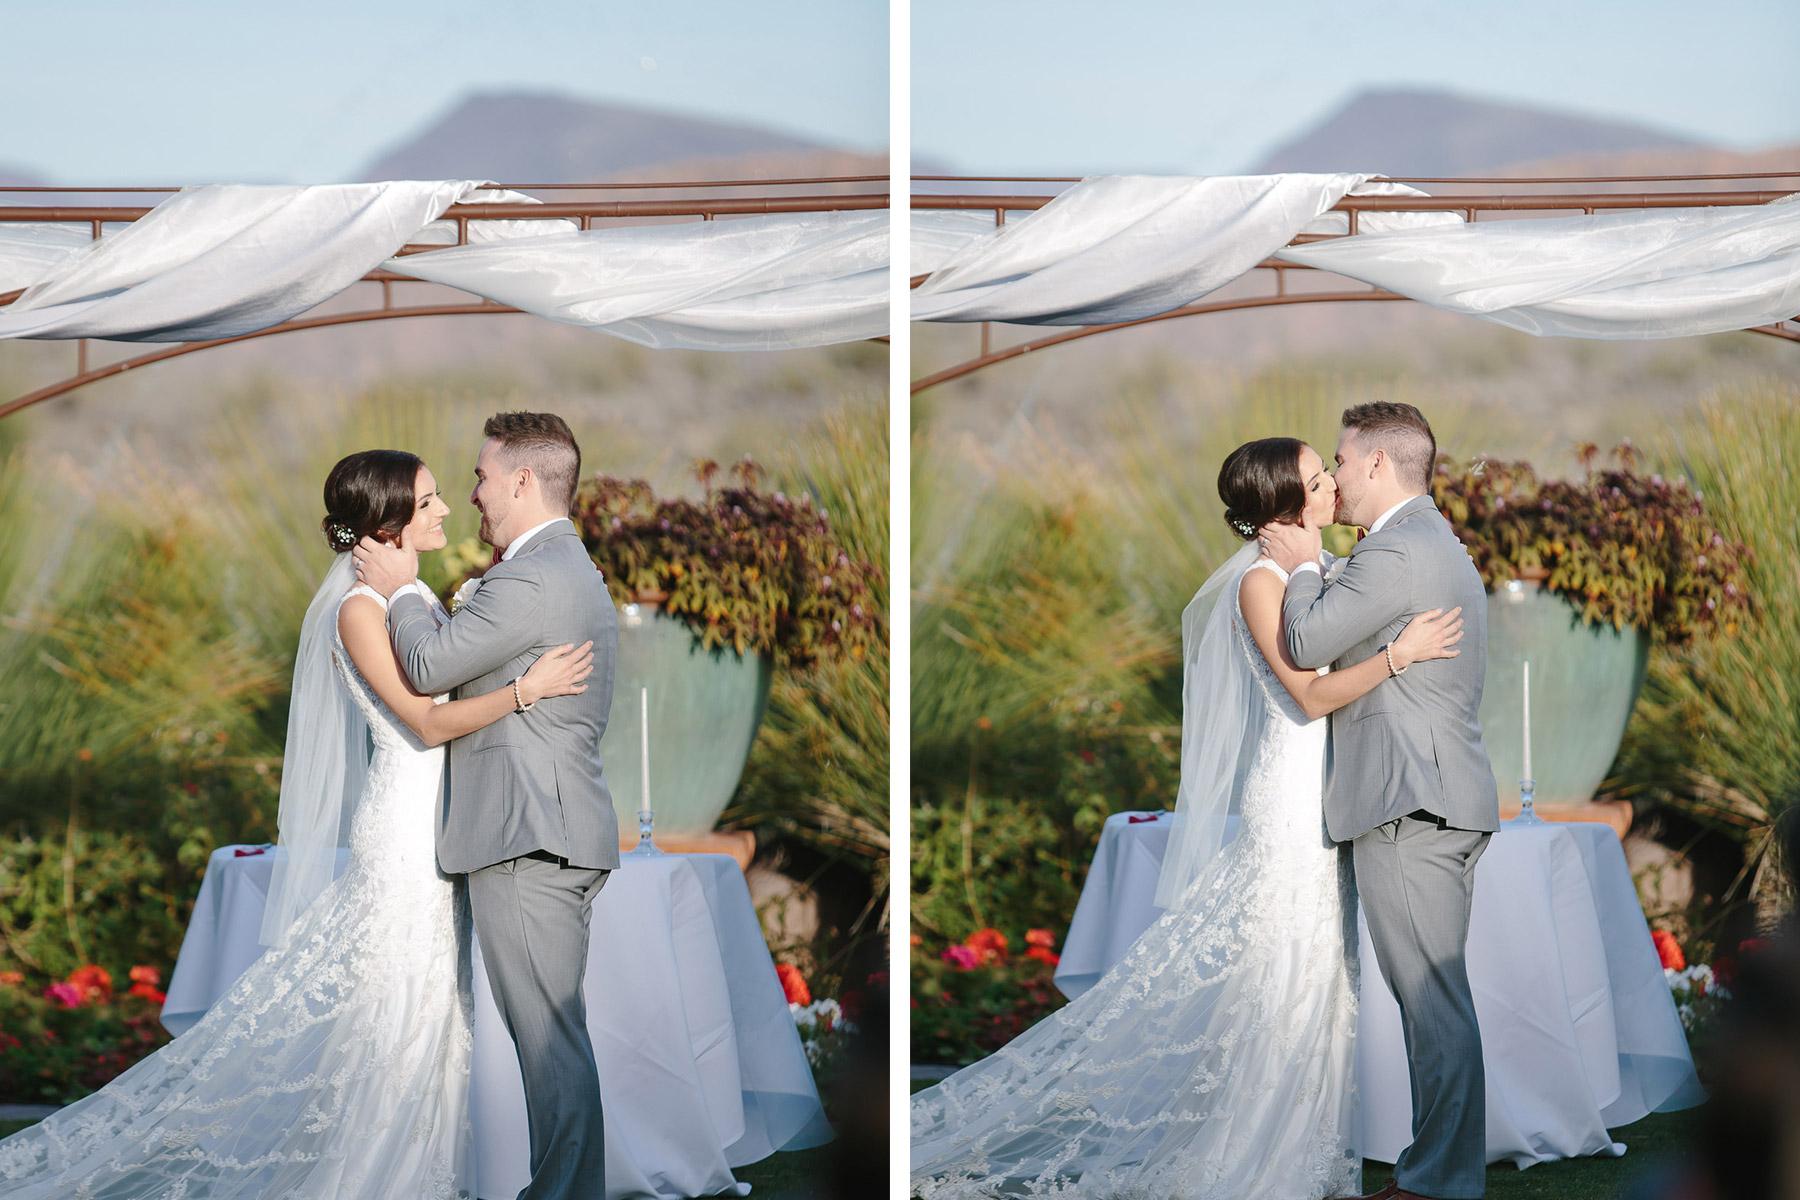 161210-Luxium-Weddings-Arizona-Matt-Jenny-Anthem-Golf-Country-Club-1038a.jpg